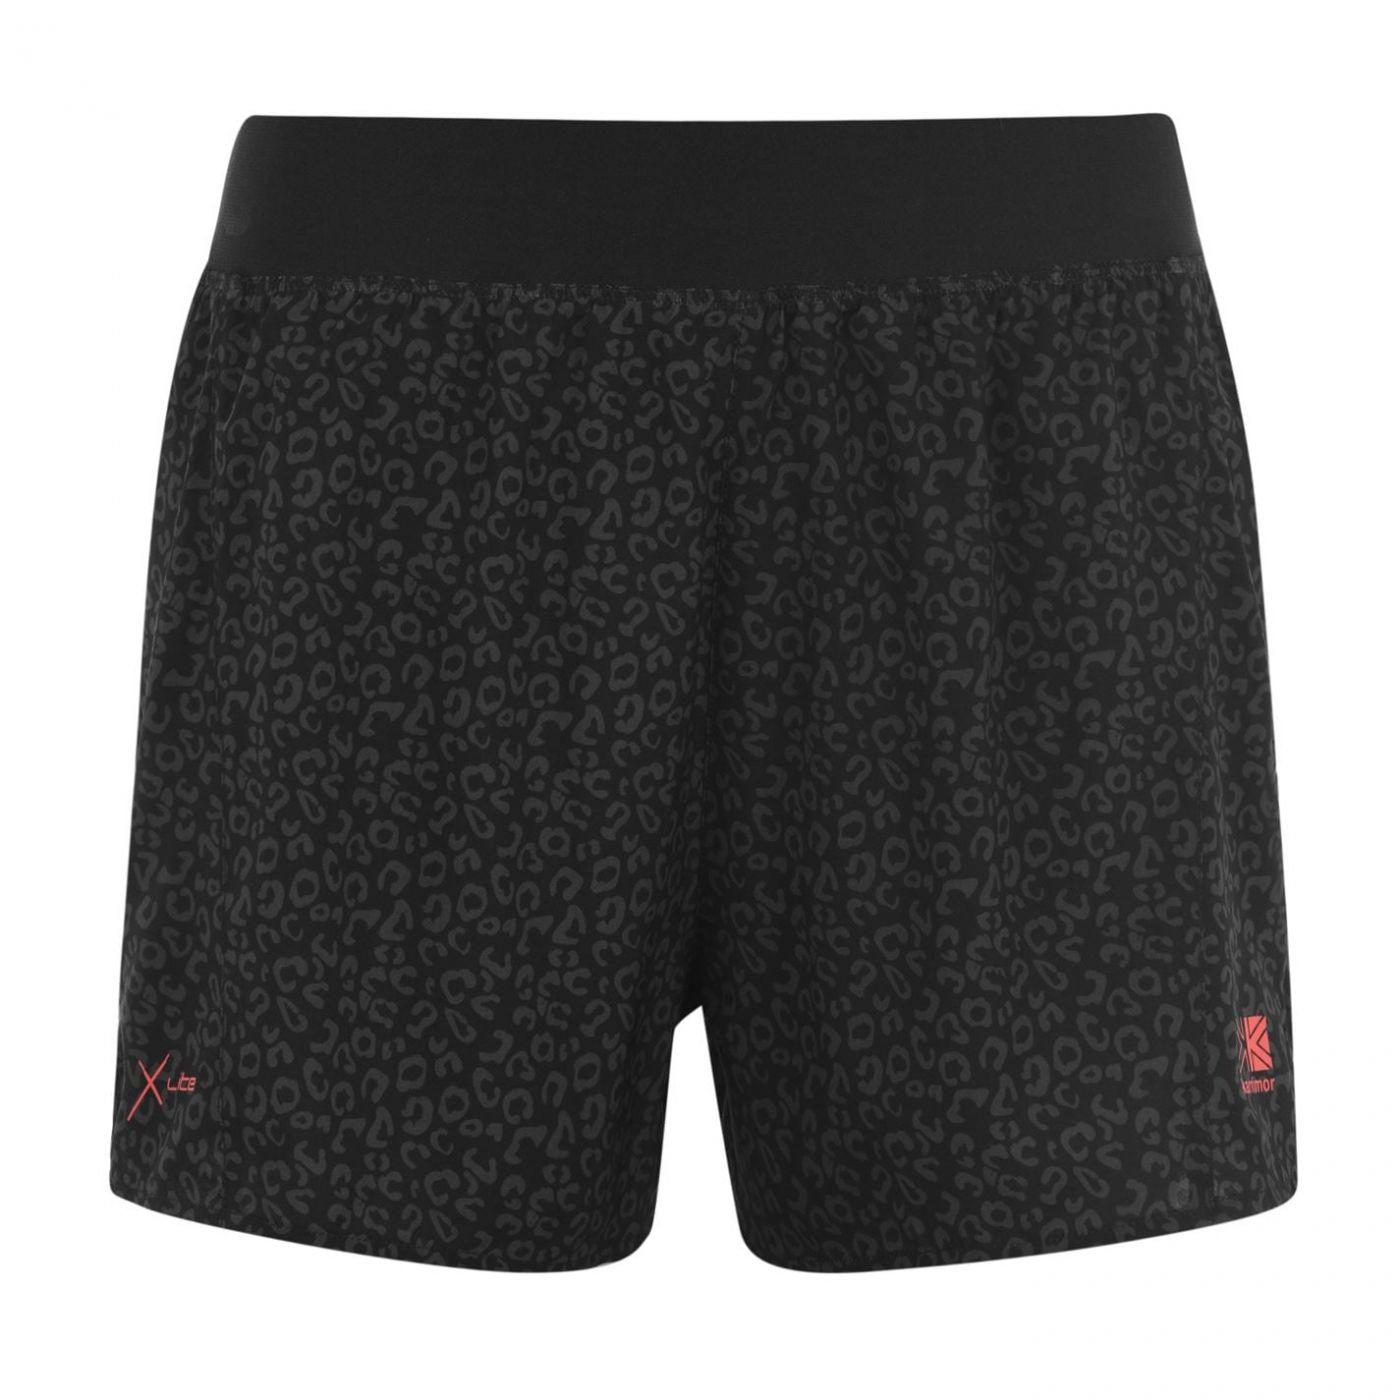 Karrimor 3inch Shorts Ladies